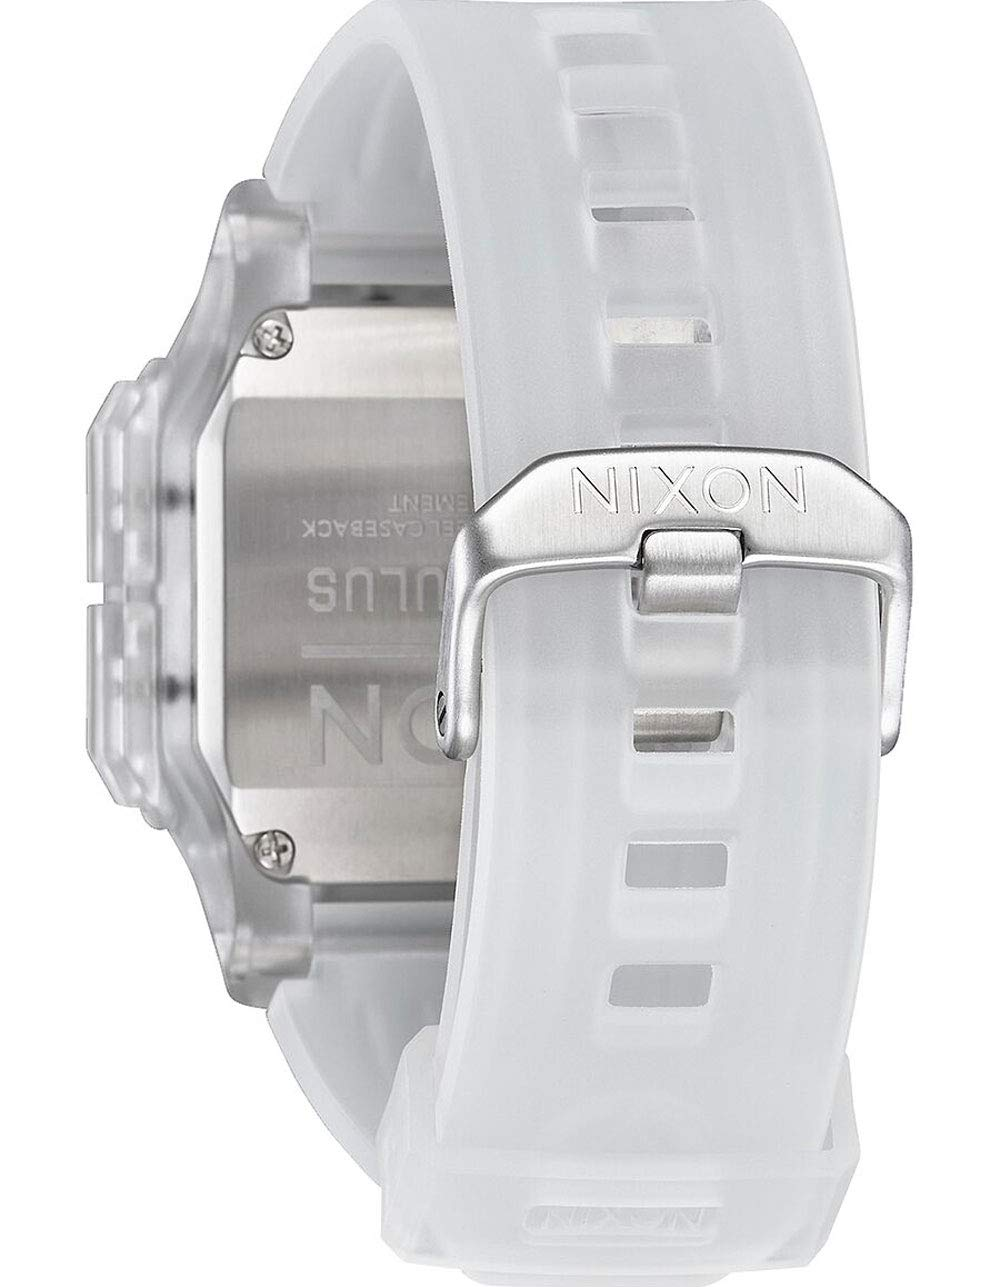 NIXON Regulus 29 mm – 24 mm PU/gummi/silikonband 32 mm ansikte Klar